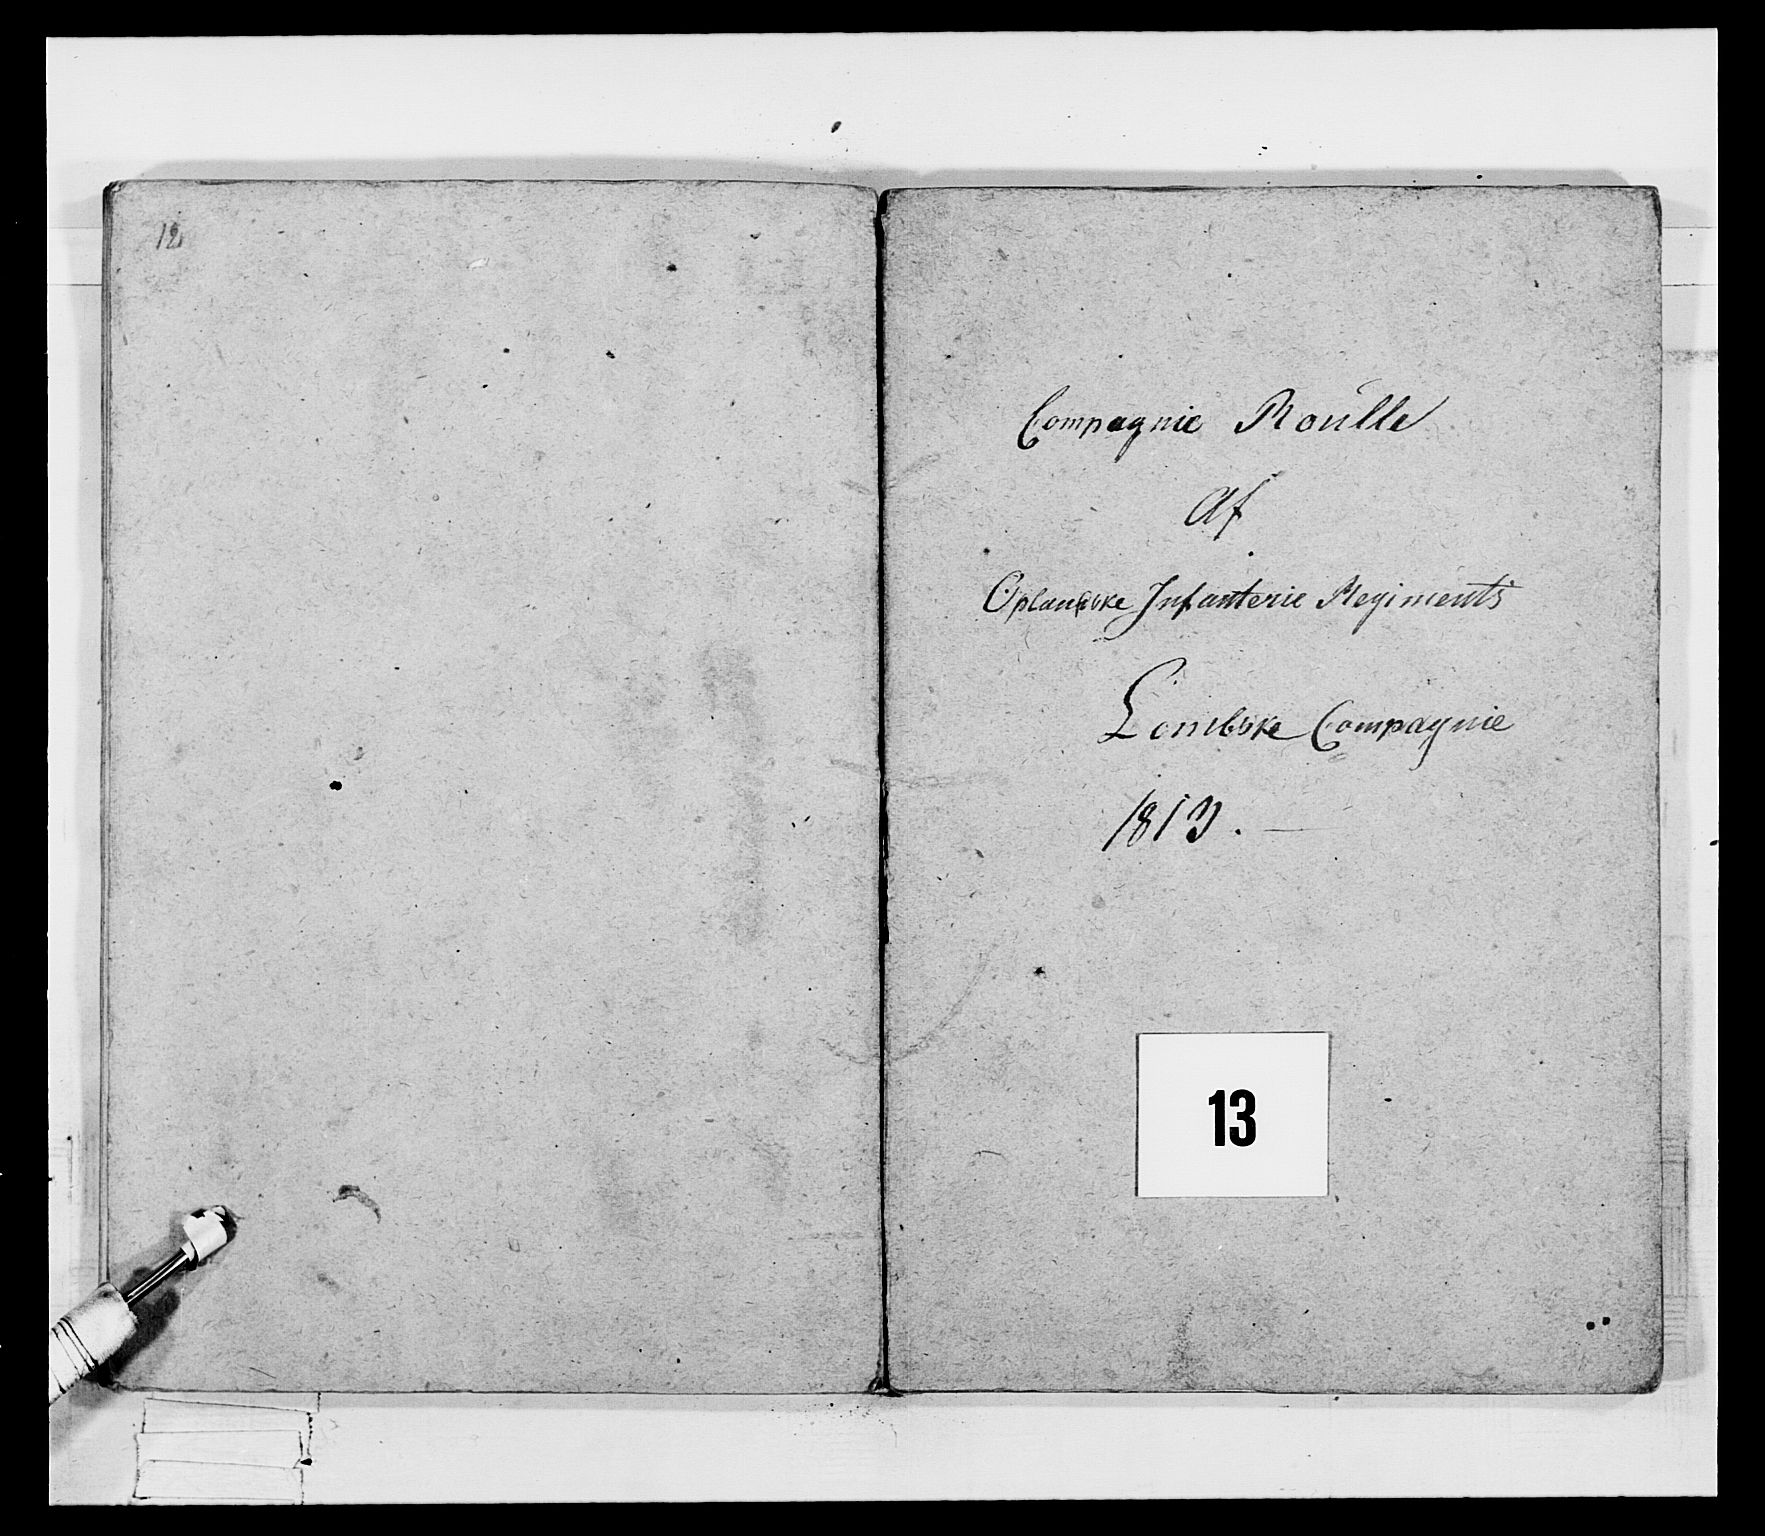 RA, Generalitets- og kommissariatskollegiet, Det kongelige norske kommissariatskollegium, E/Eh/L0069: Opplandske gevorbne infanteriregiment, 1810-1818, s. 616